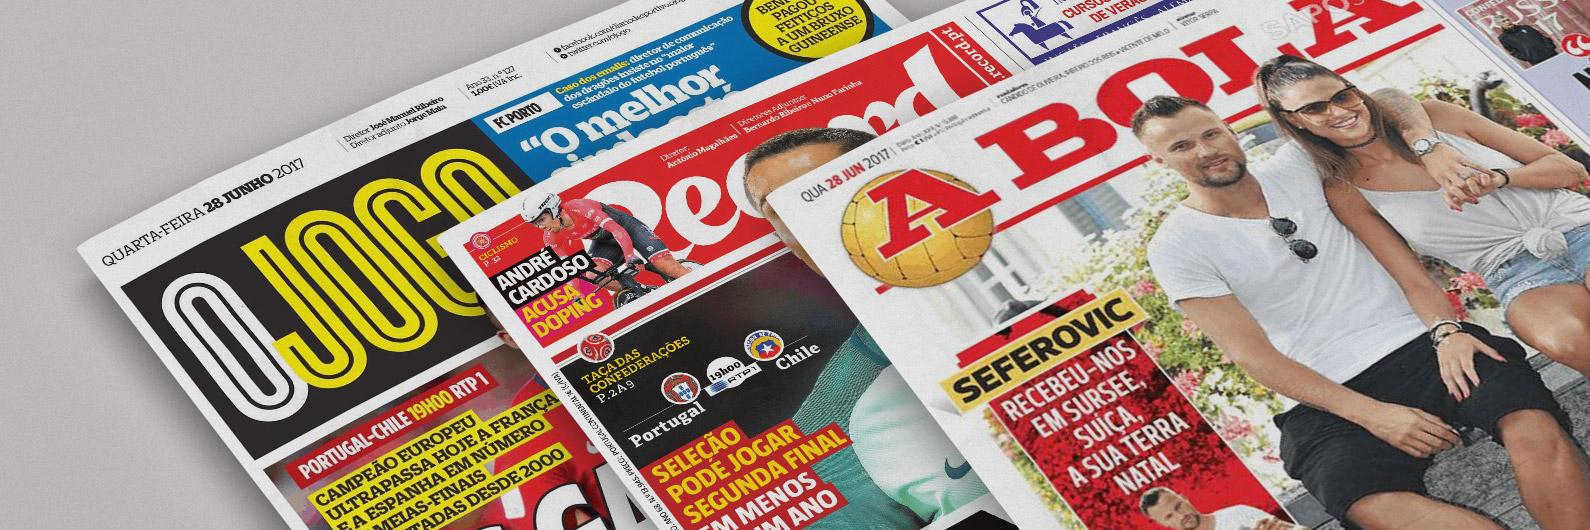 Revista de Imprensa: Seferovic intromete-se entre Portugal e Chile nas manchetes